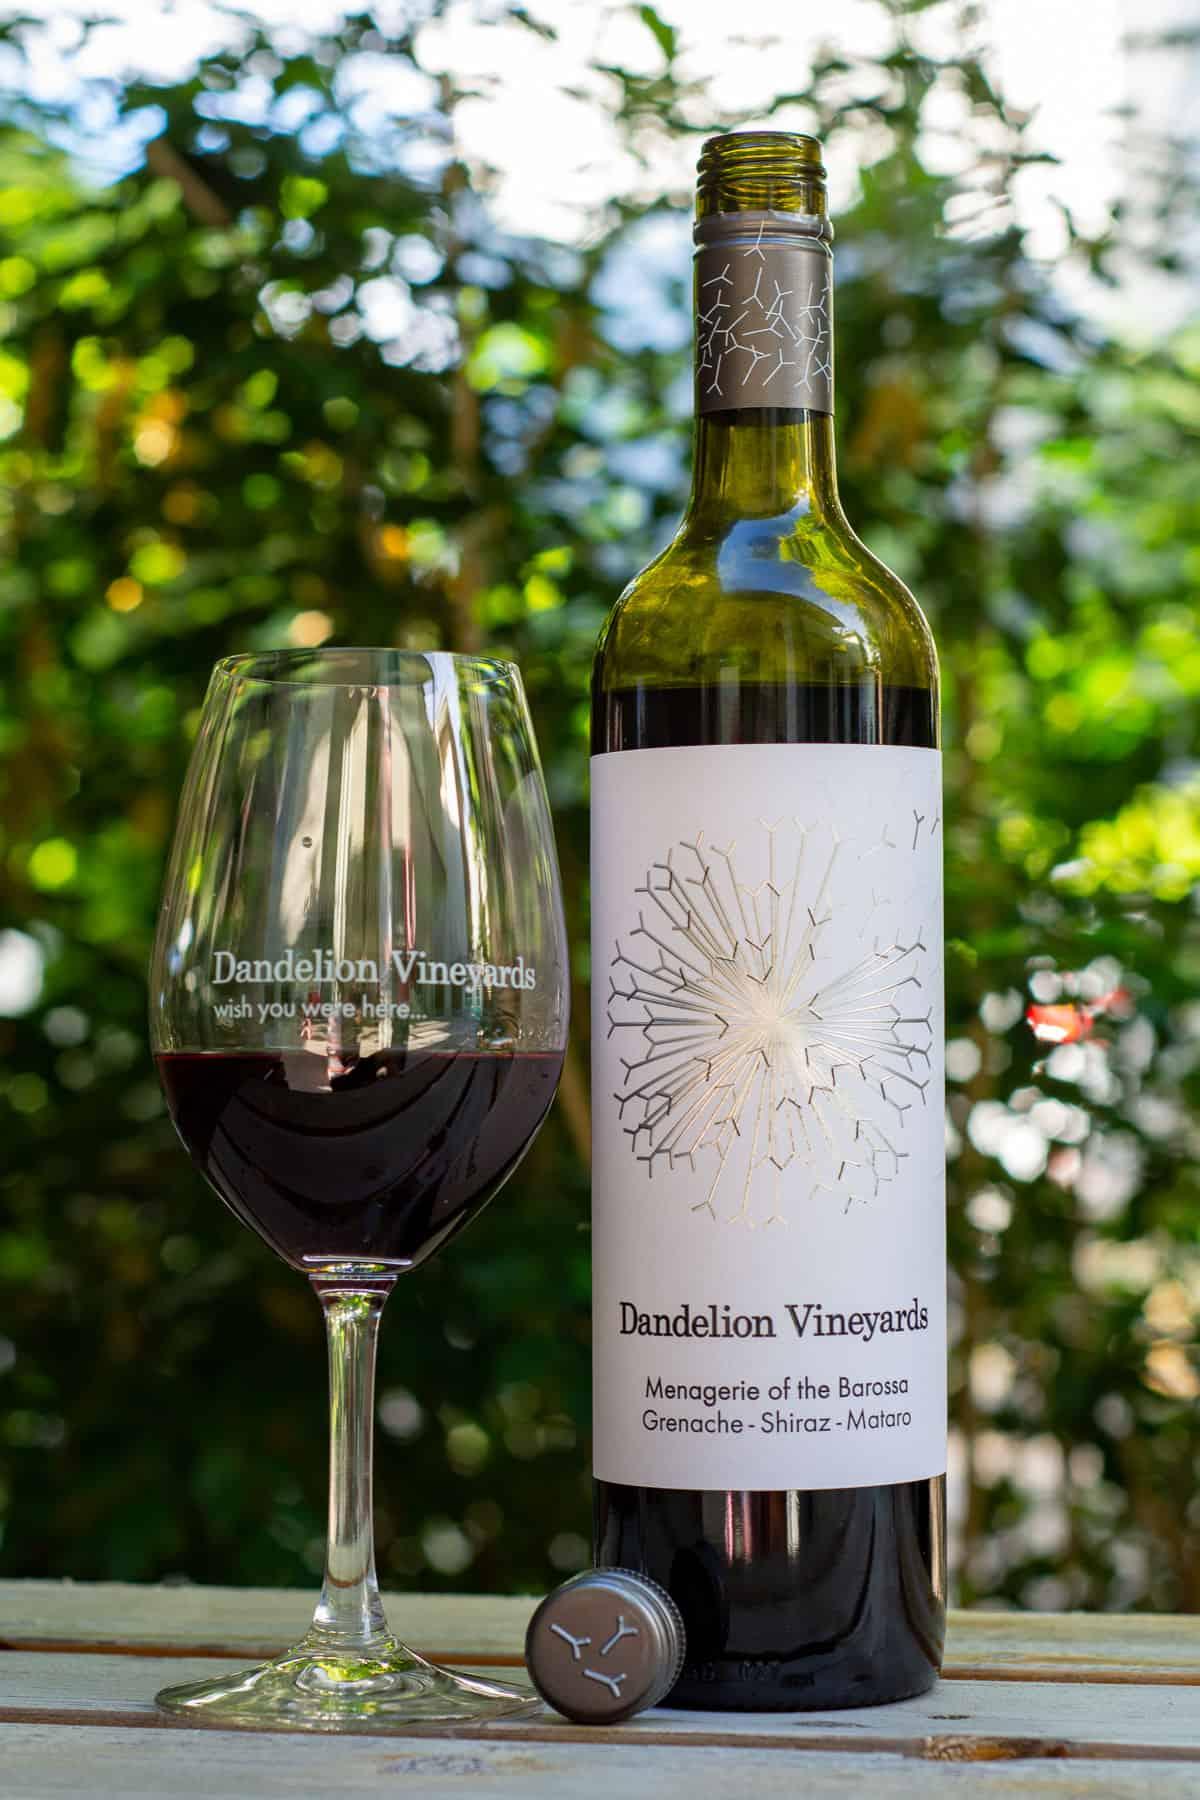 Dandelion GSM wine bottle and glass